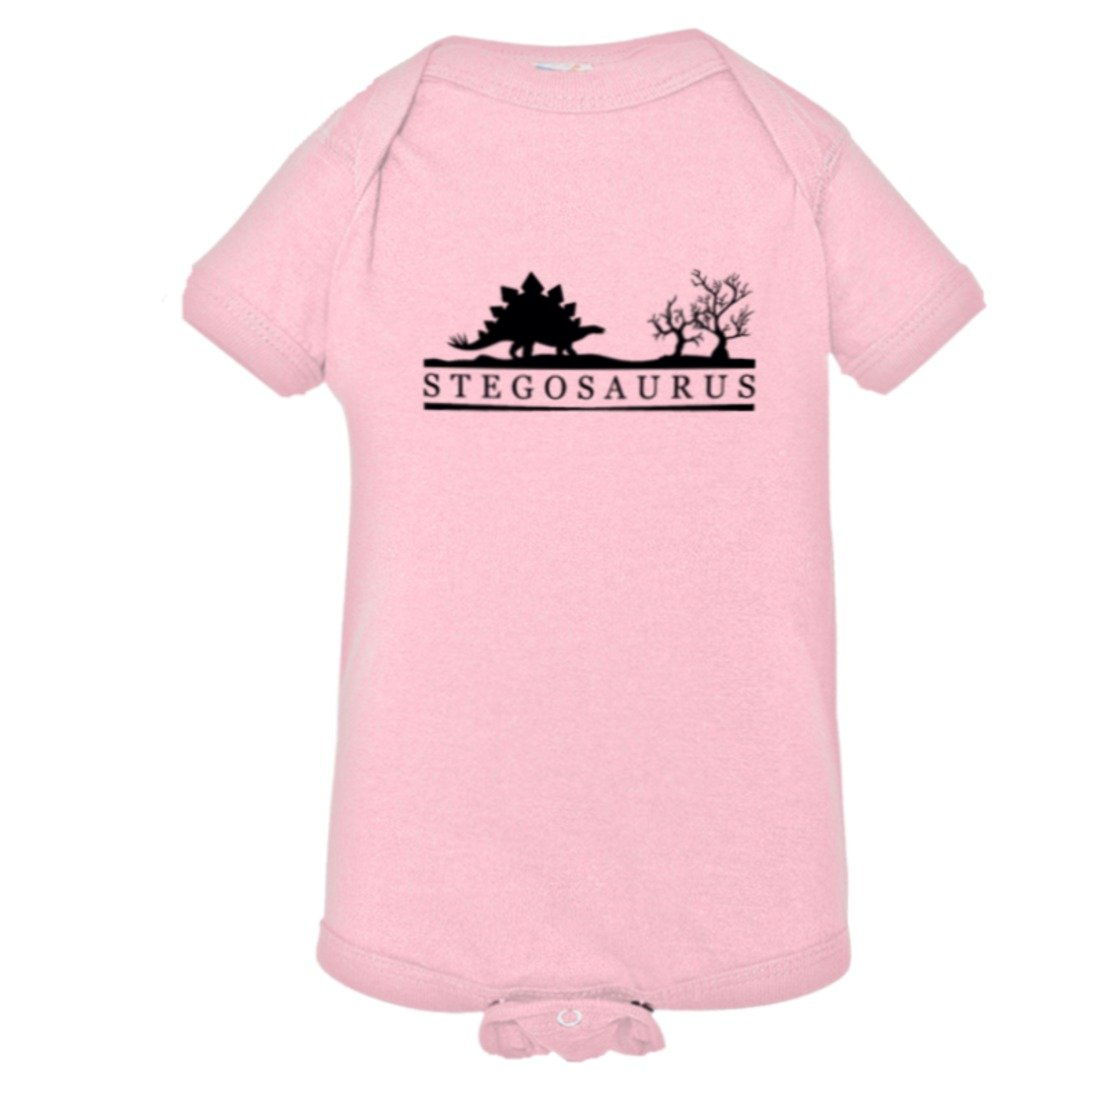 PleaseMeTees Baby Stegosaurus Educational Dinosaur Jurassic HQ Bodysuit 1-Piece